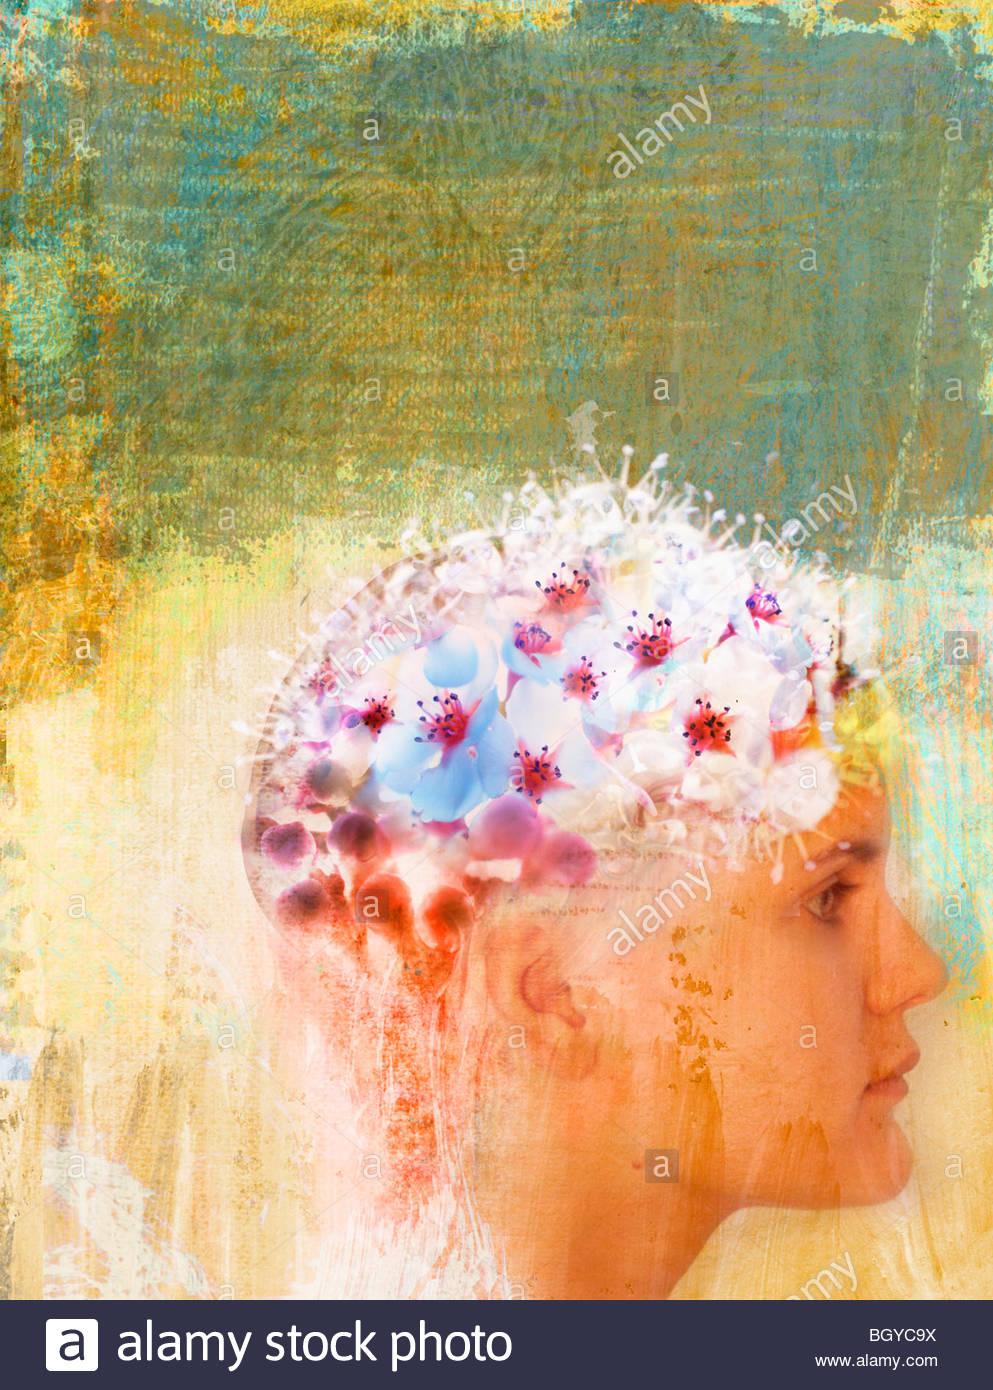 Frau mit Blumen auf Kopf Stockbild